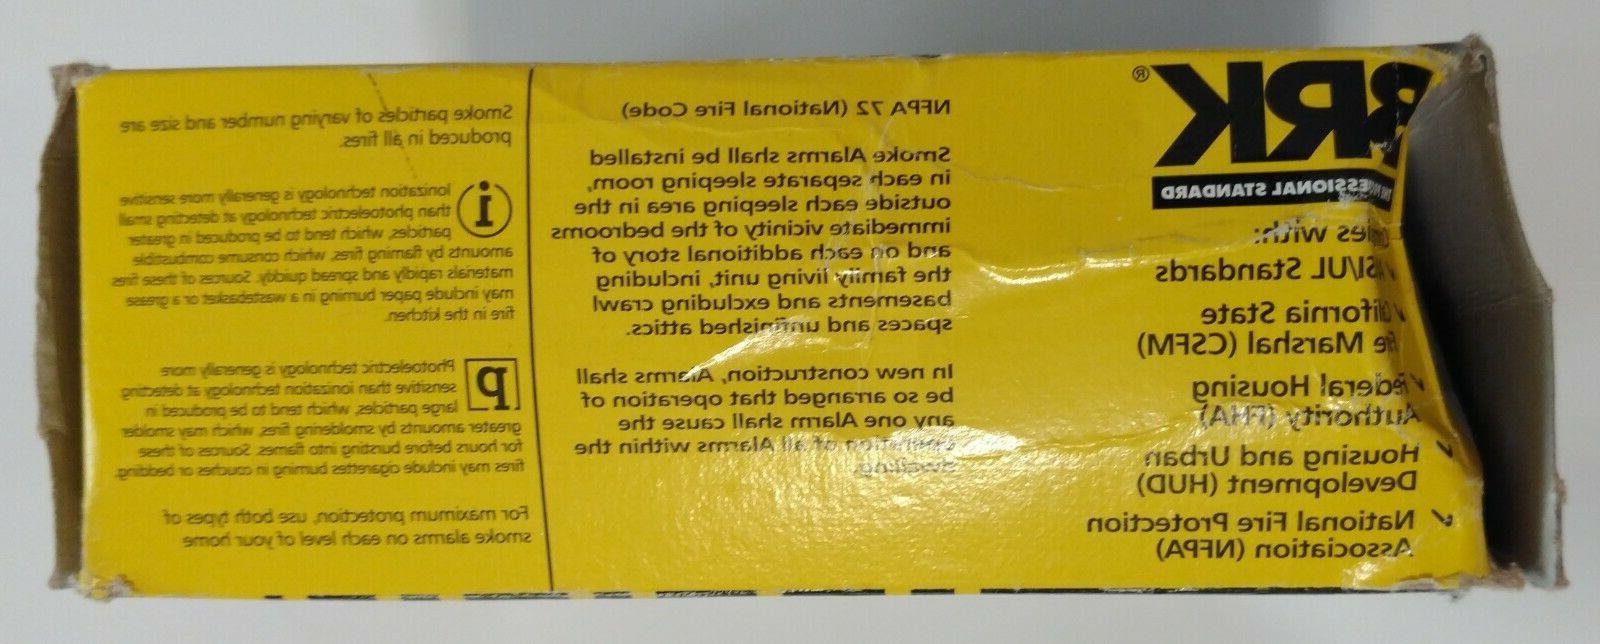 BRK First Carbon Monoxide & Smoke Alarm AC Power Batterybackup